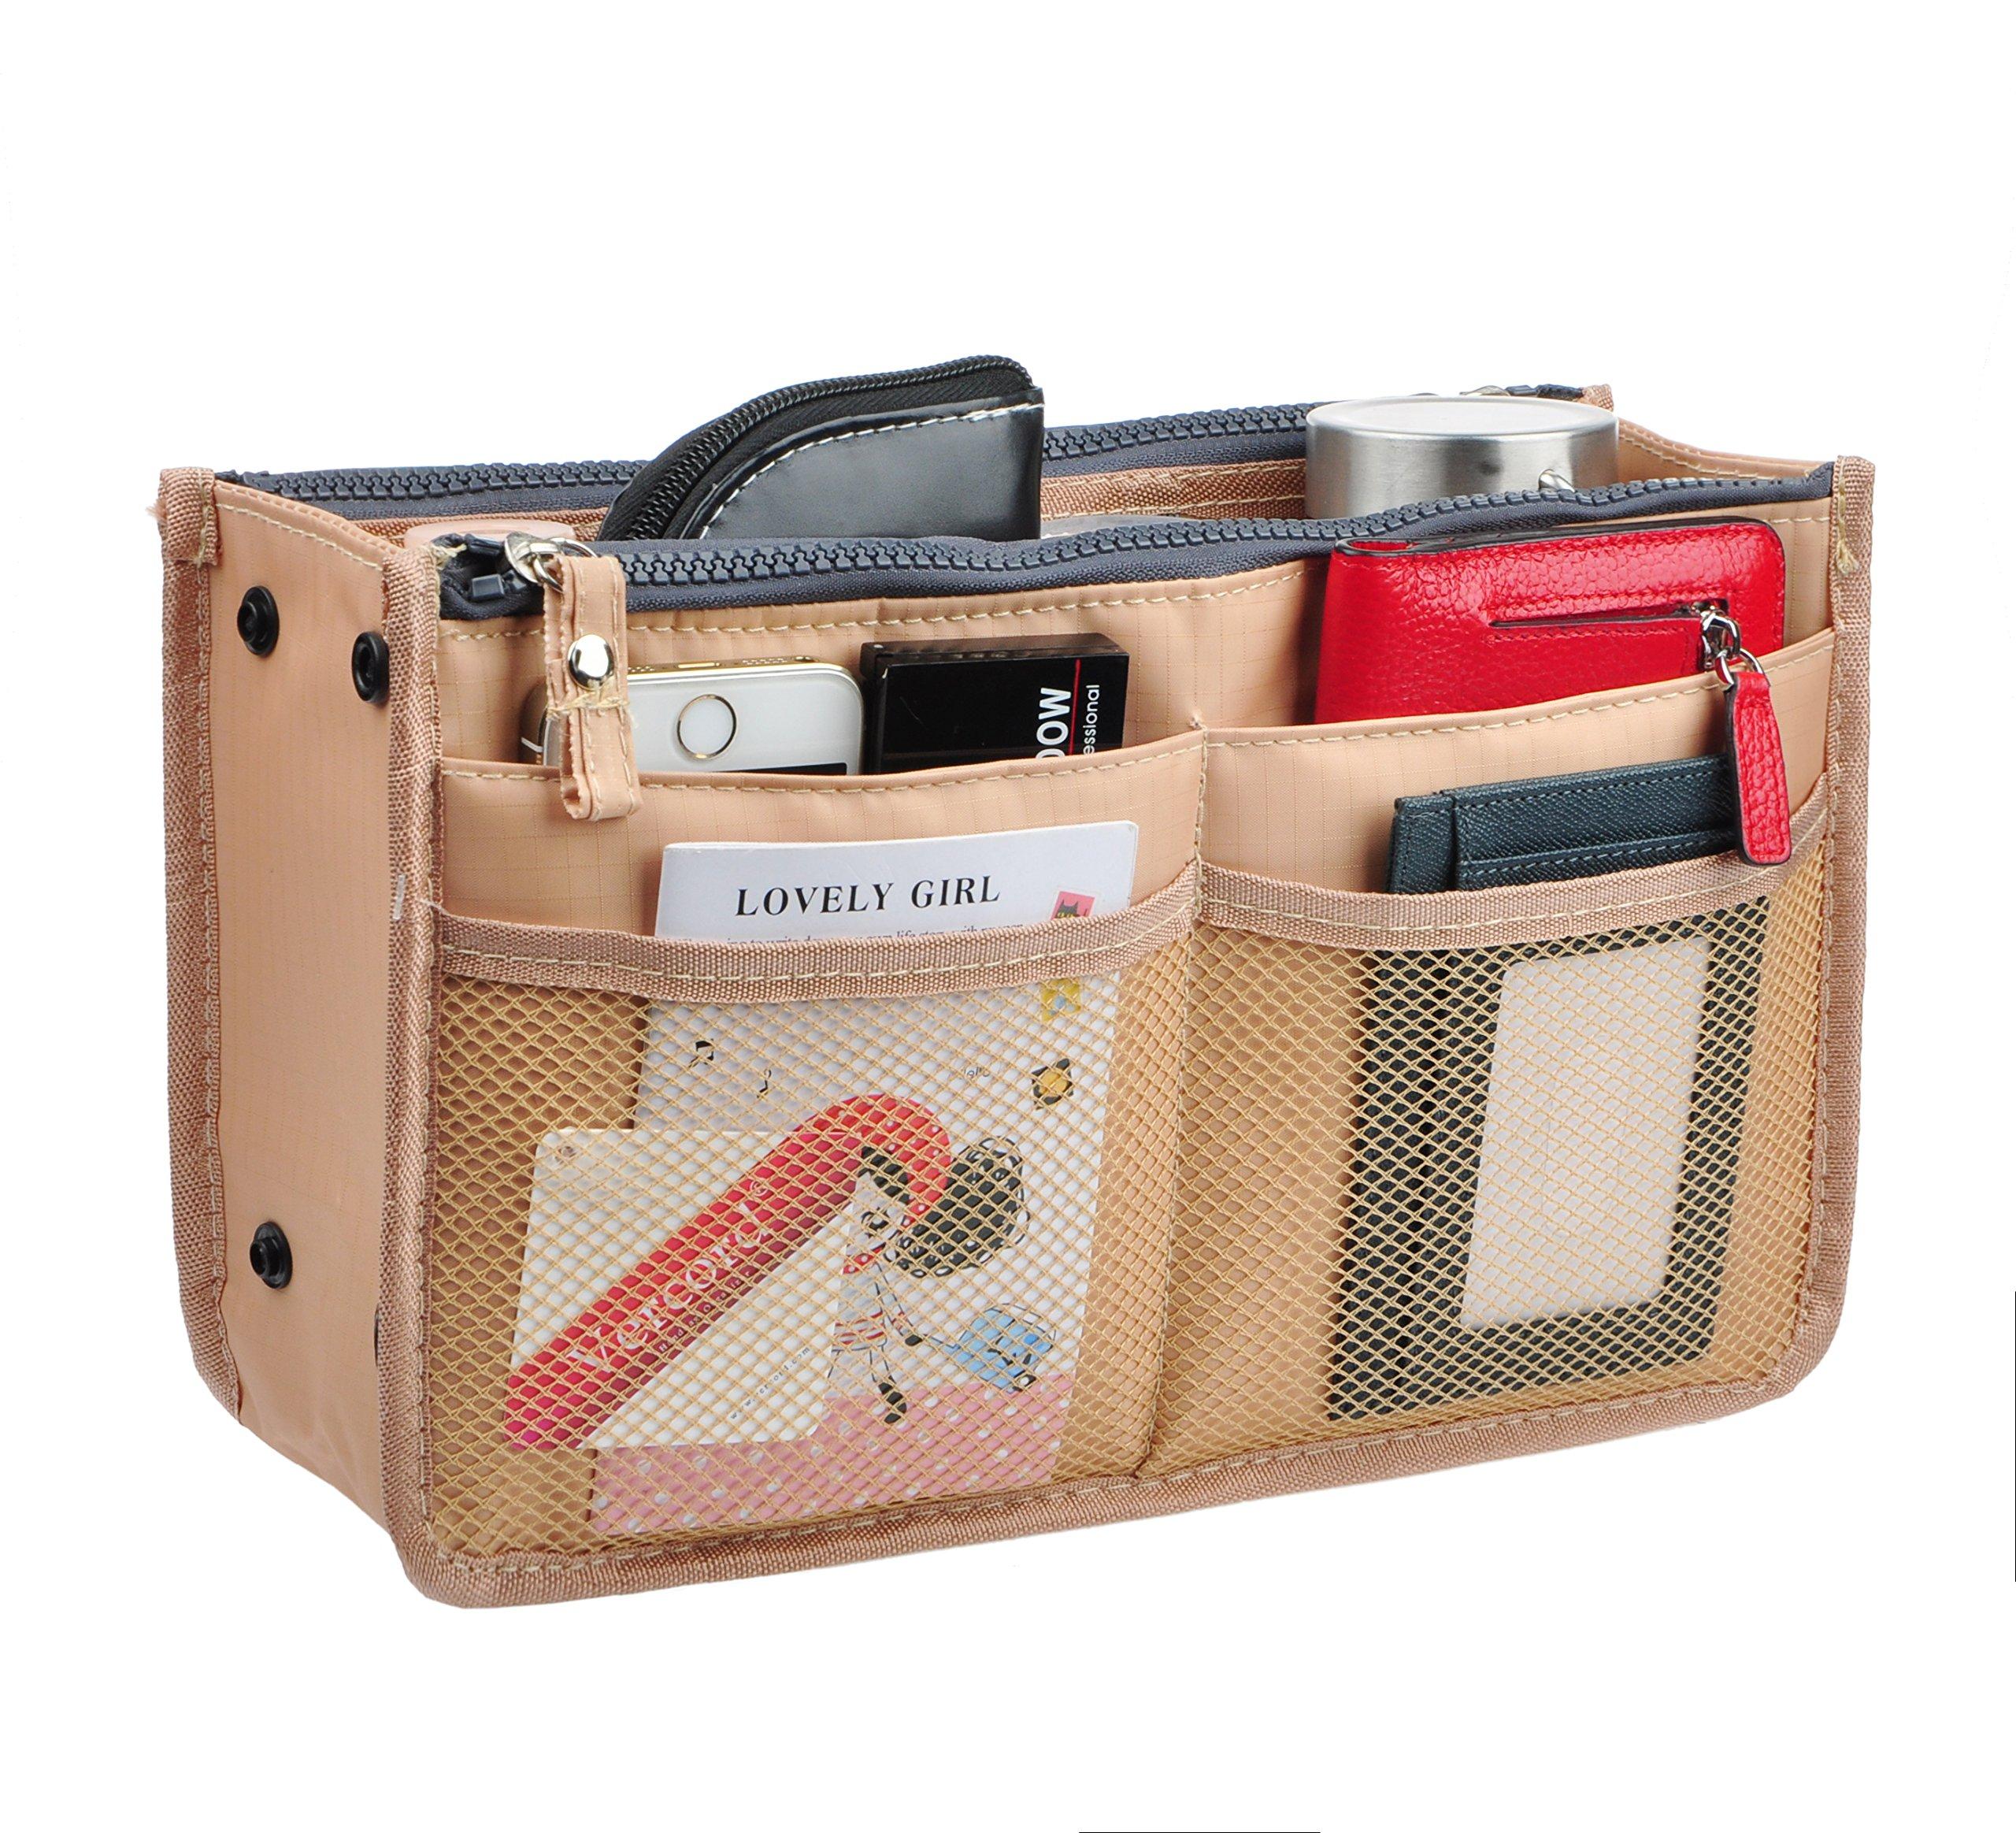 Vercord Updated Purse Handbag Organizer Insert Liner Bag in Bag 13 Pockets 3 Size, Khaki M